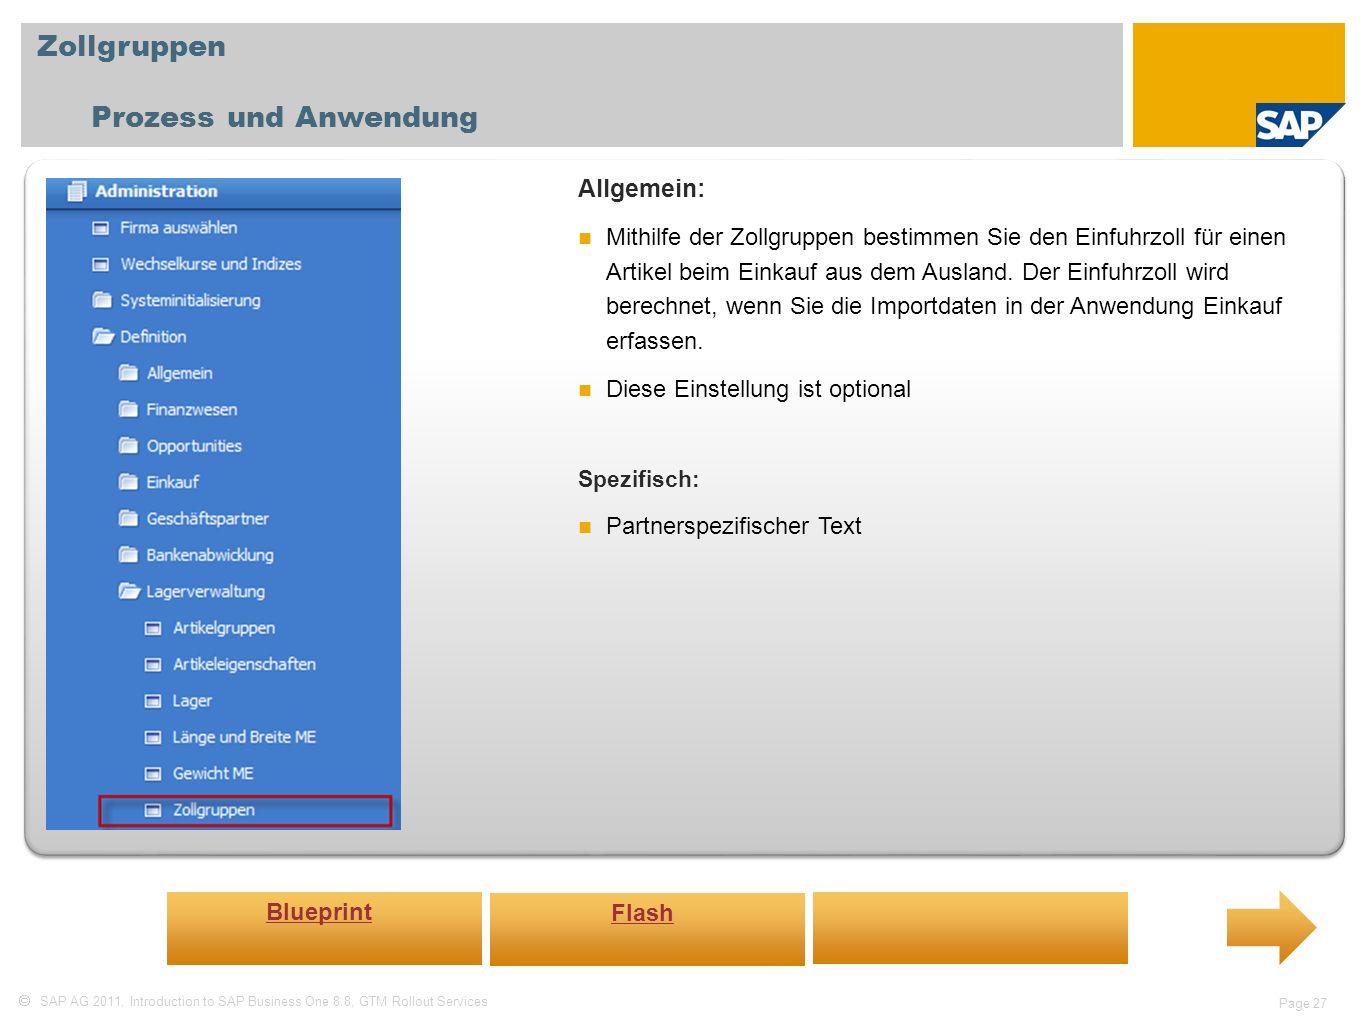 SAP AG 2011, Introduction to SAP Business One 8.8, GTM Rollout Services Page 27 Zollgruppen Prozess und Anwendung Allgemein: Mithilfe der Zollgruppen